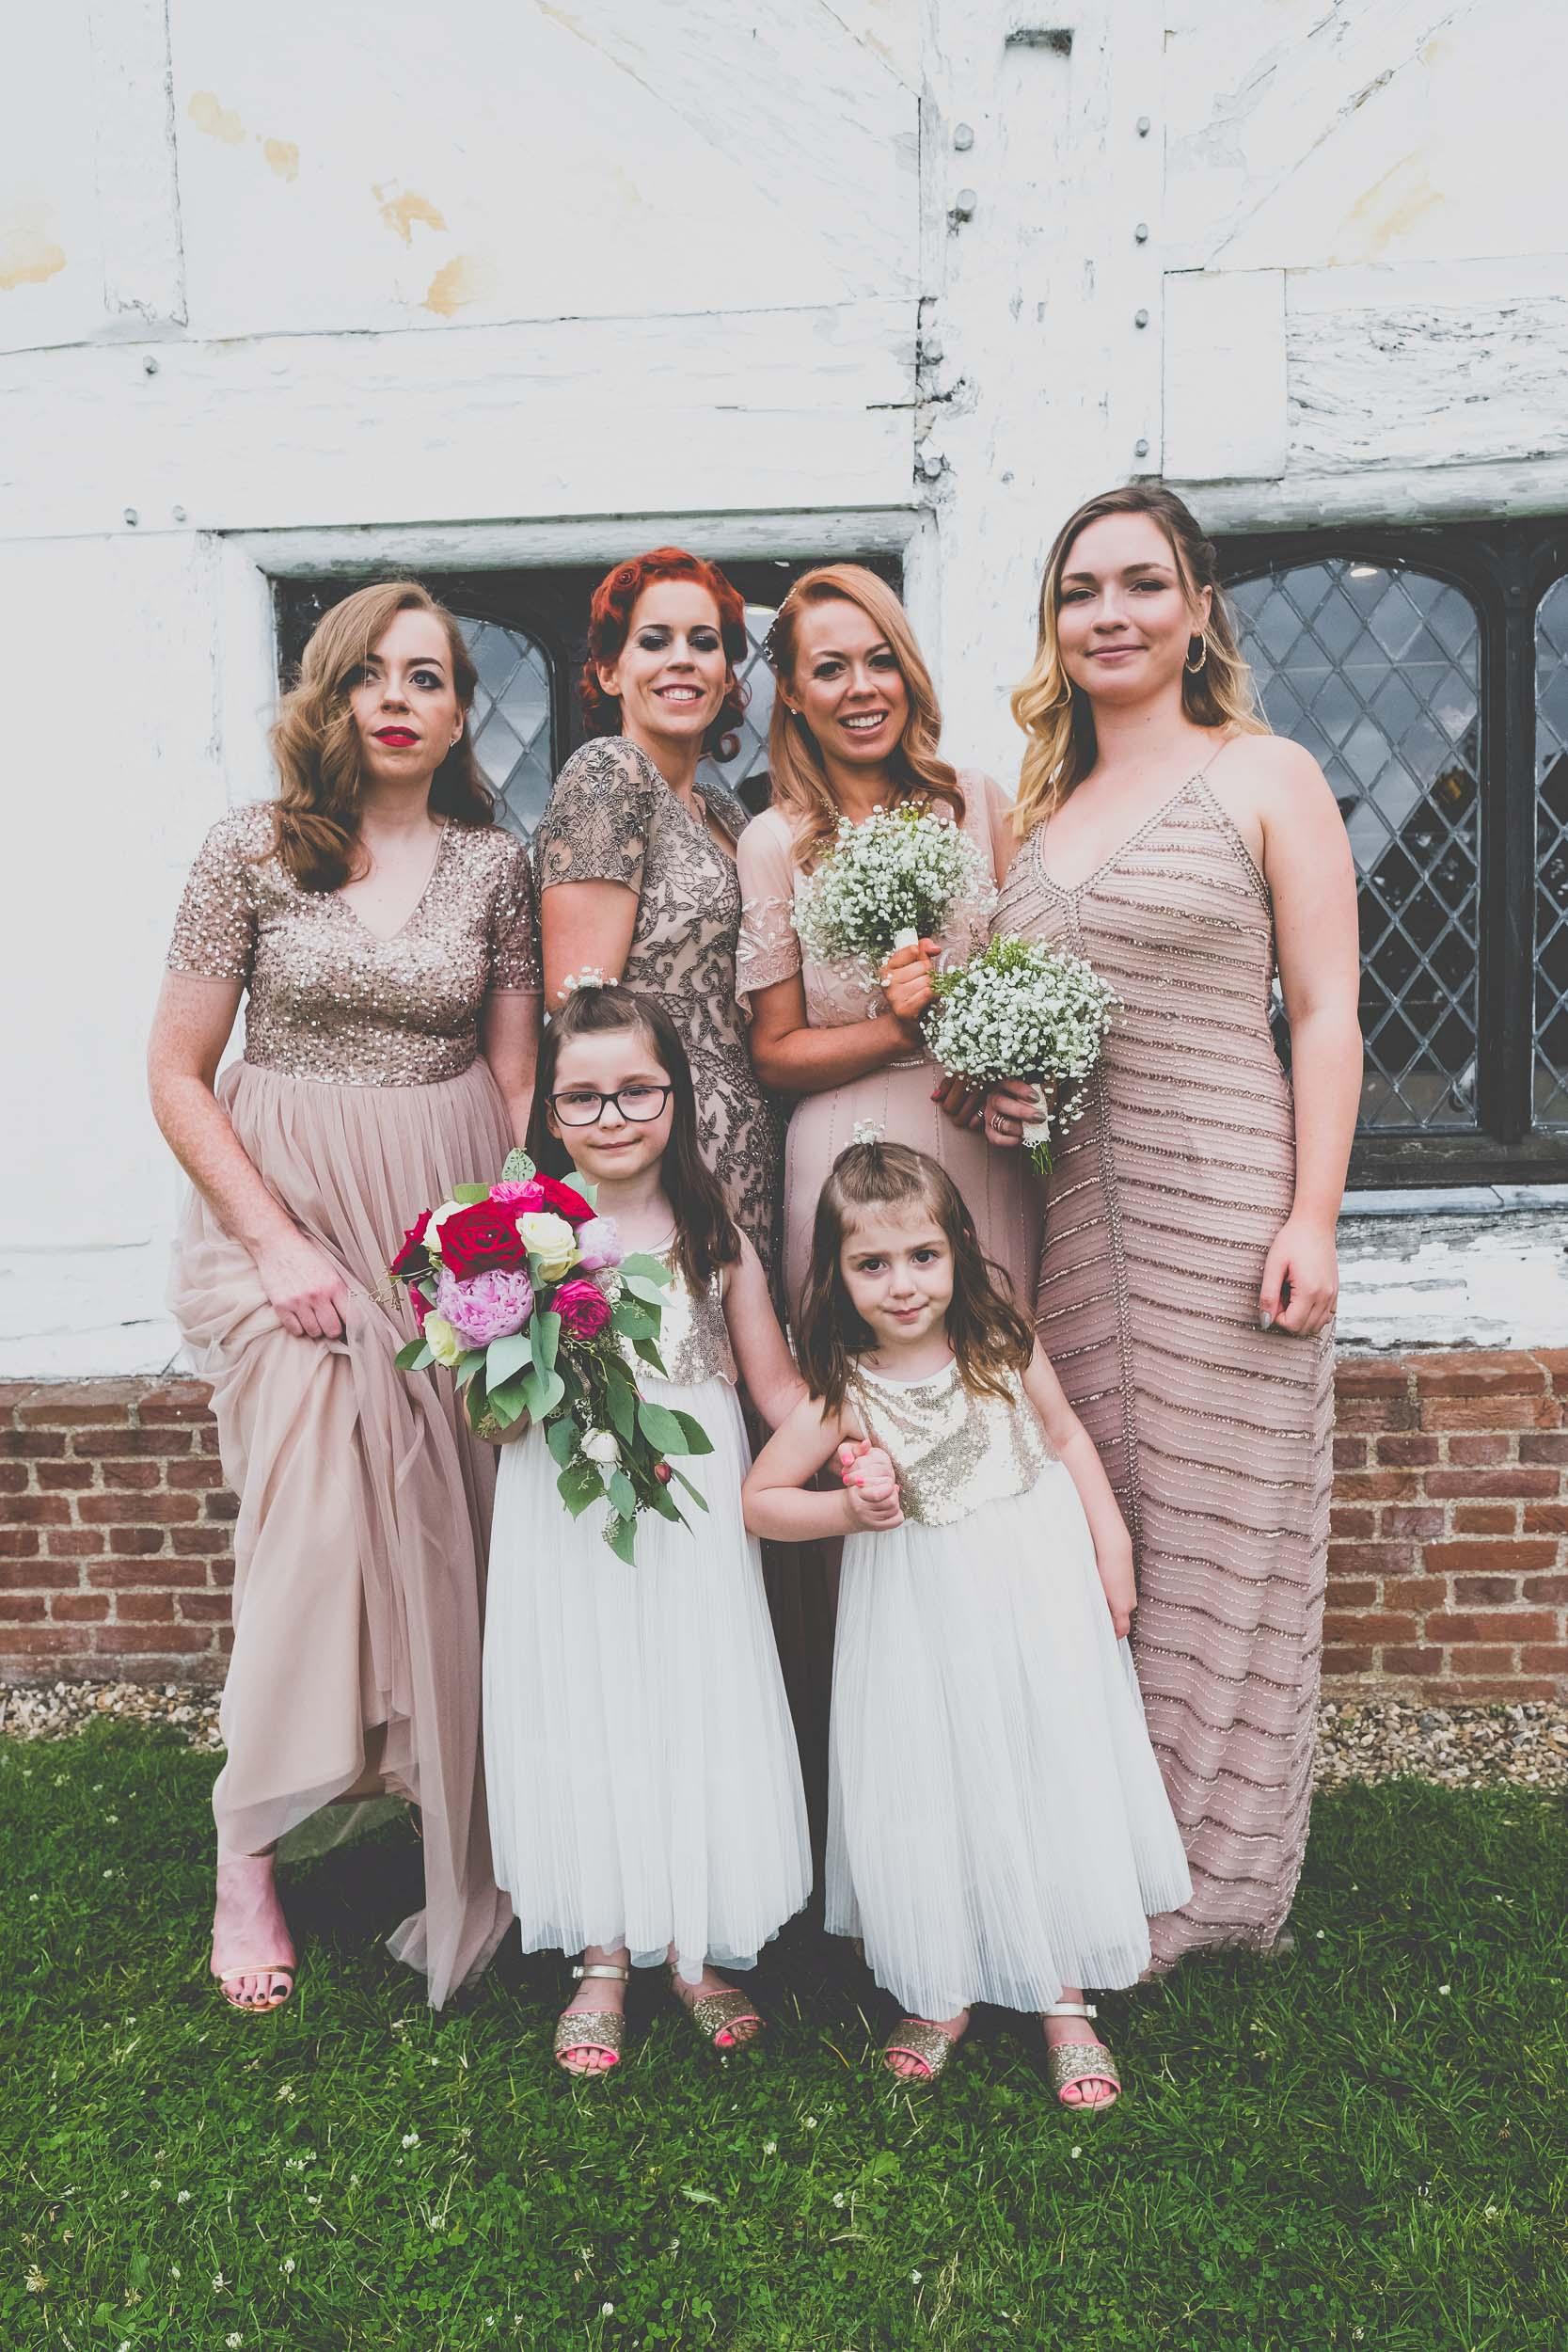 queen-elizabeths-hunting-lodge-epping-forest-wedding180.jpg